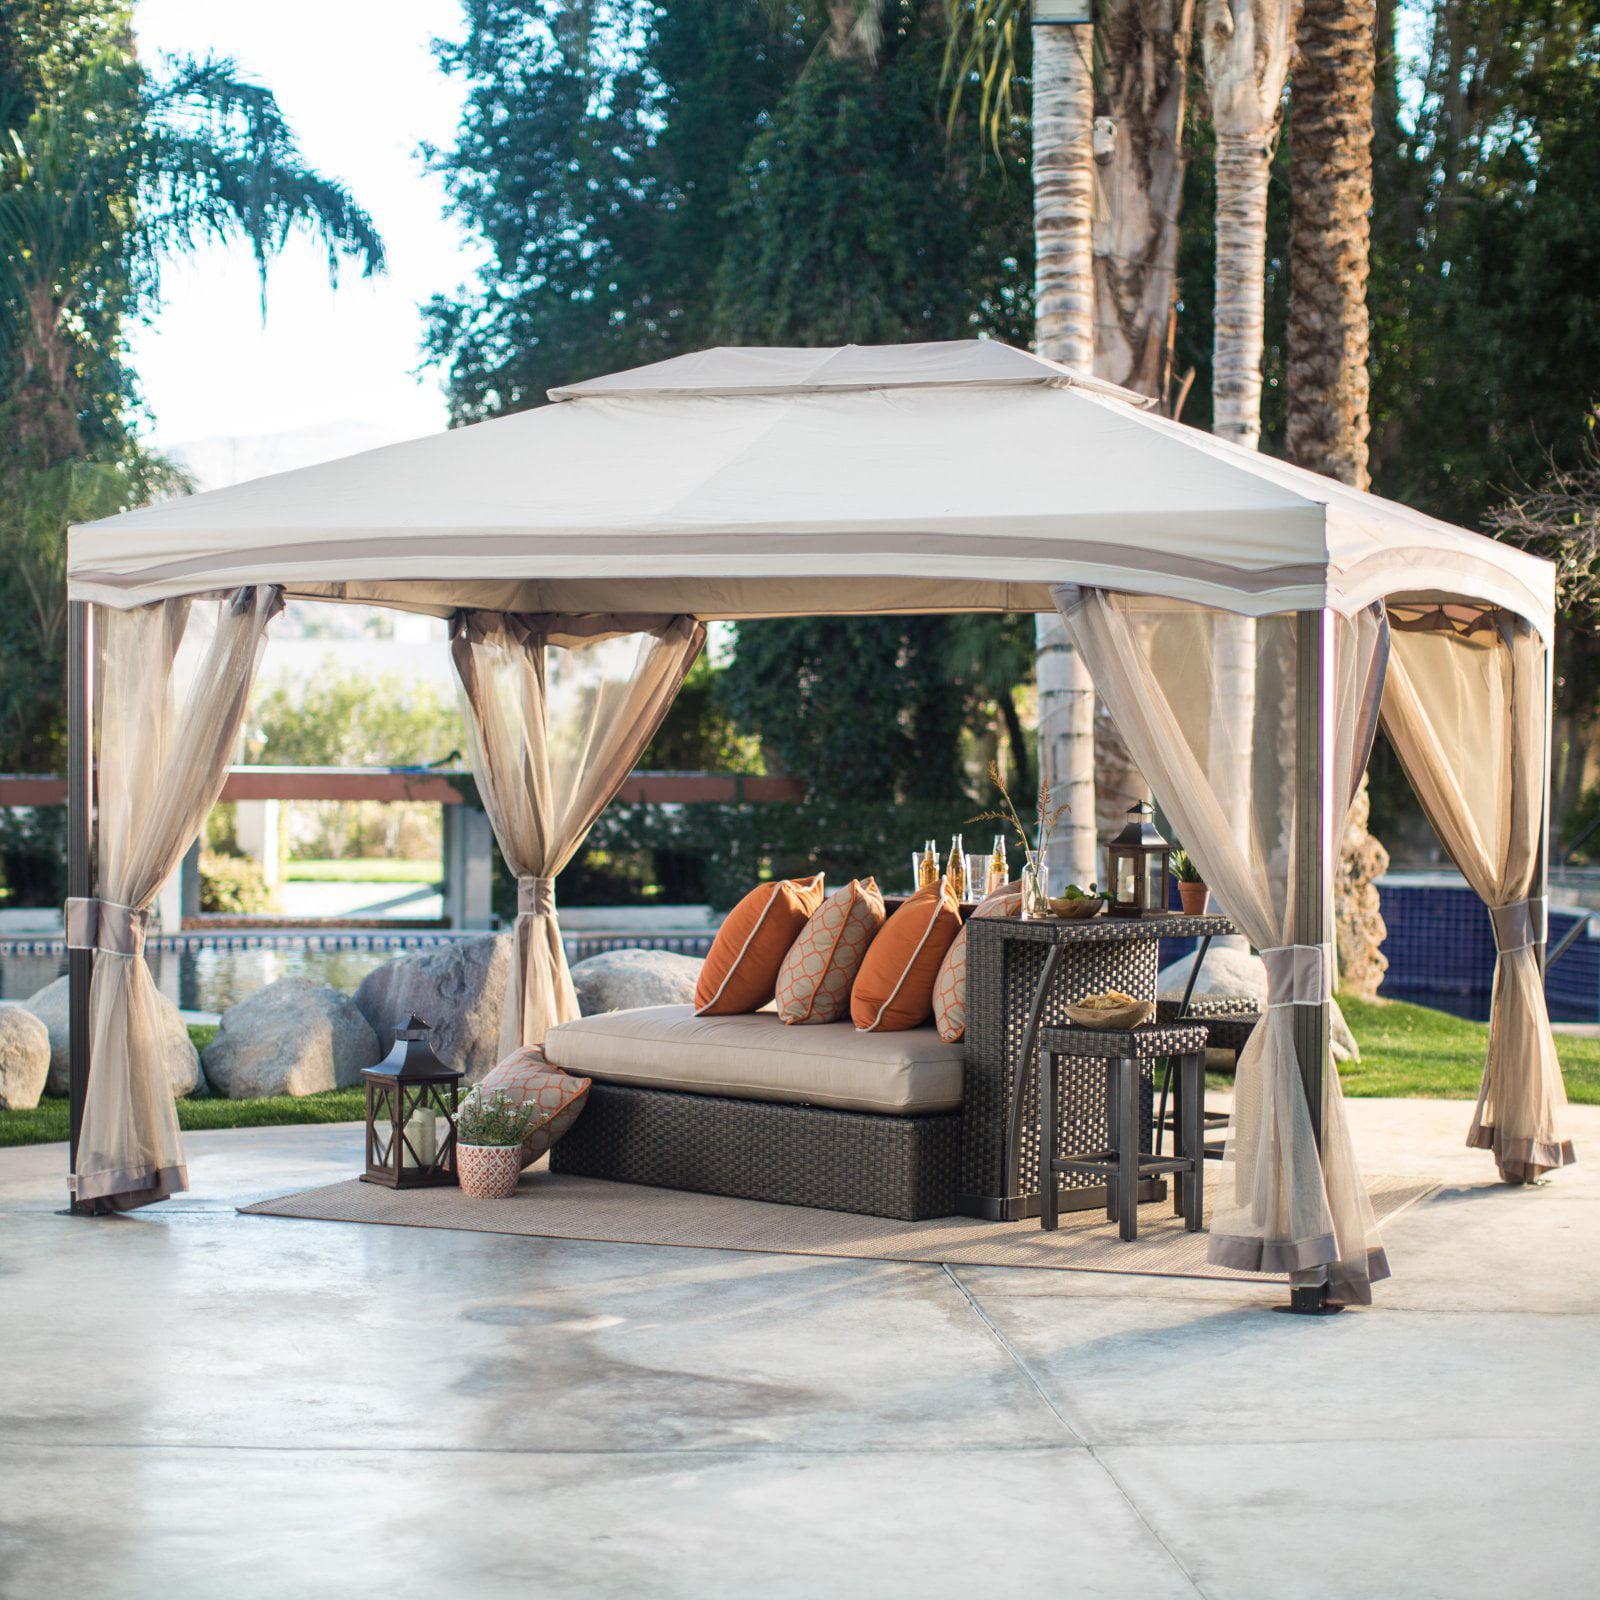 Belham Living Catina 13 x 10 ft. Cabin Style Garden House Canopy Gazebo by